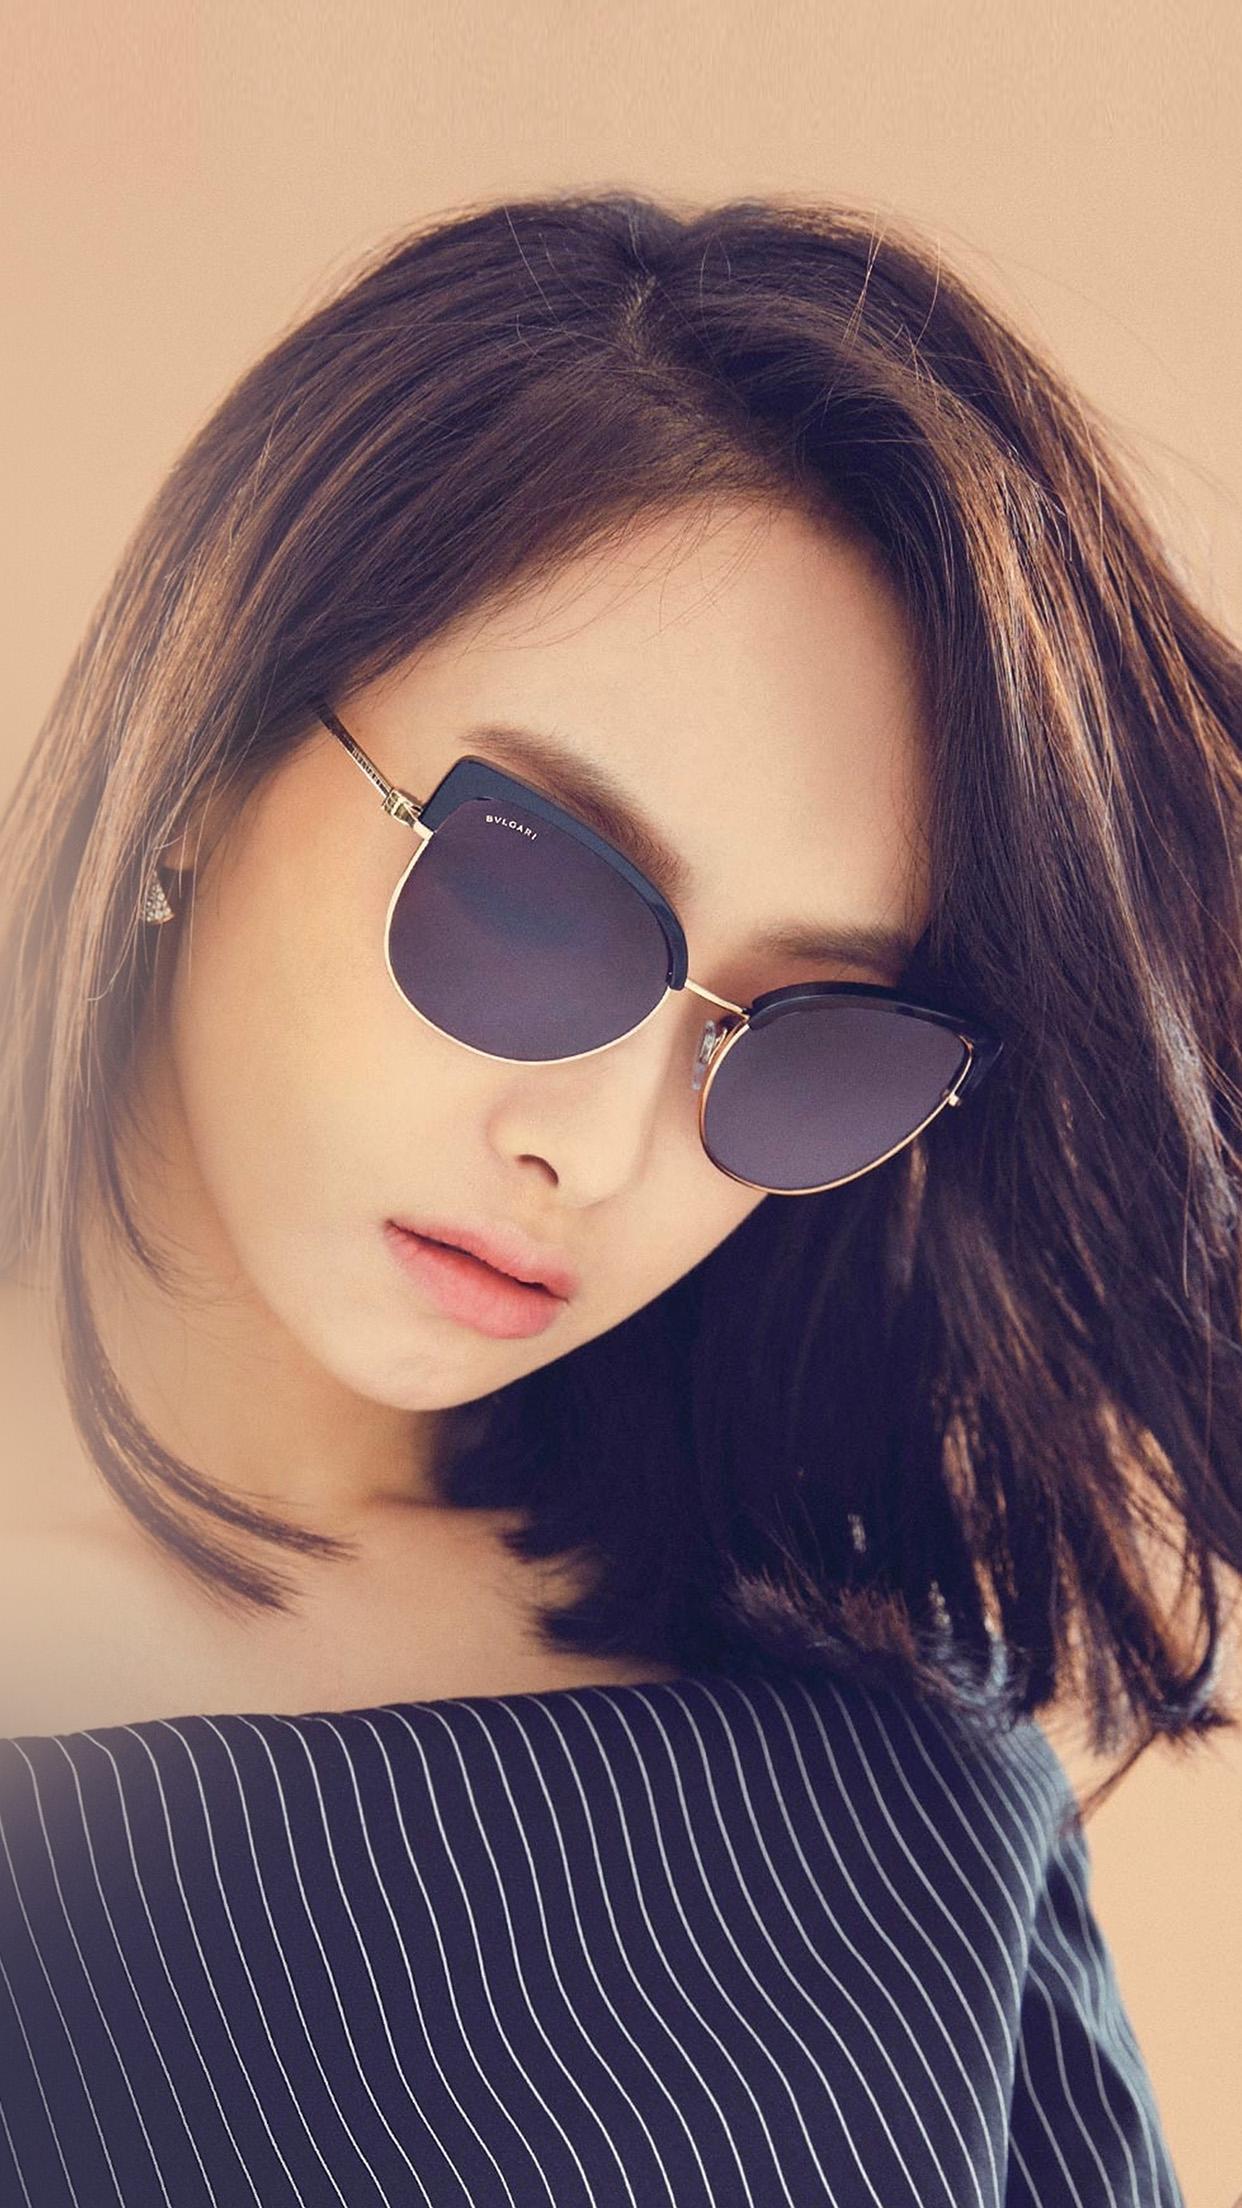 Iphone6papers Co Iphone 6 Wallpaper Hi91 Victoria Kpop Star Fx Girl